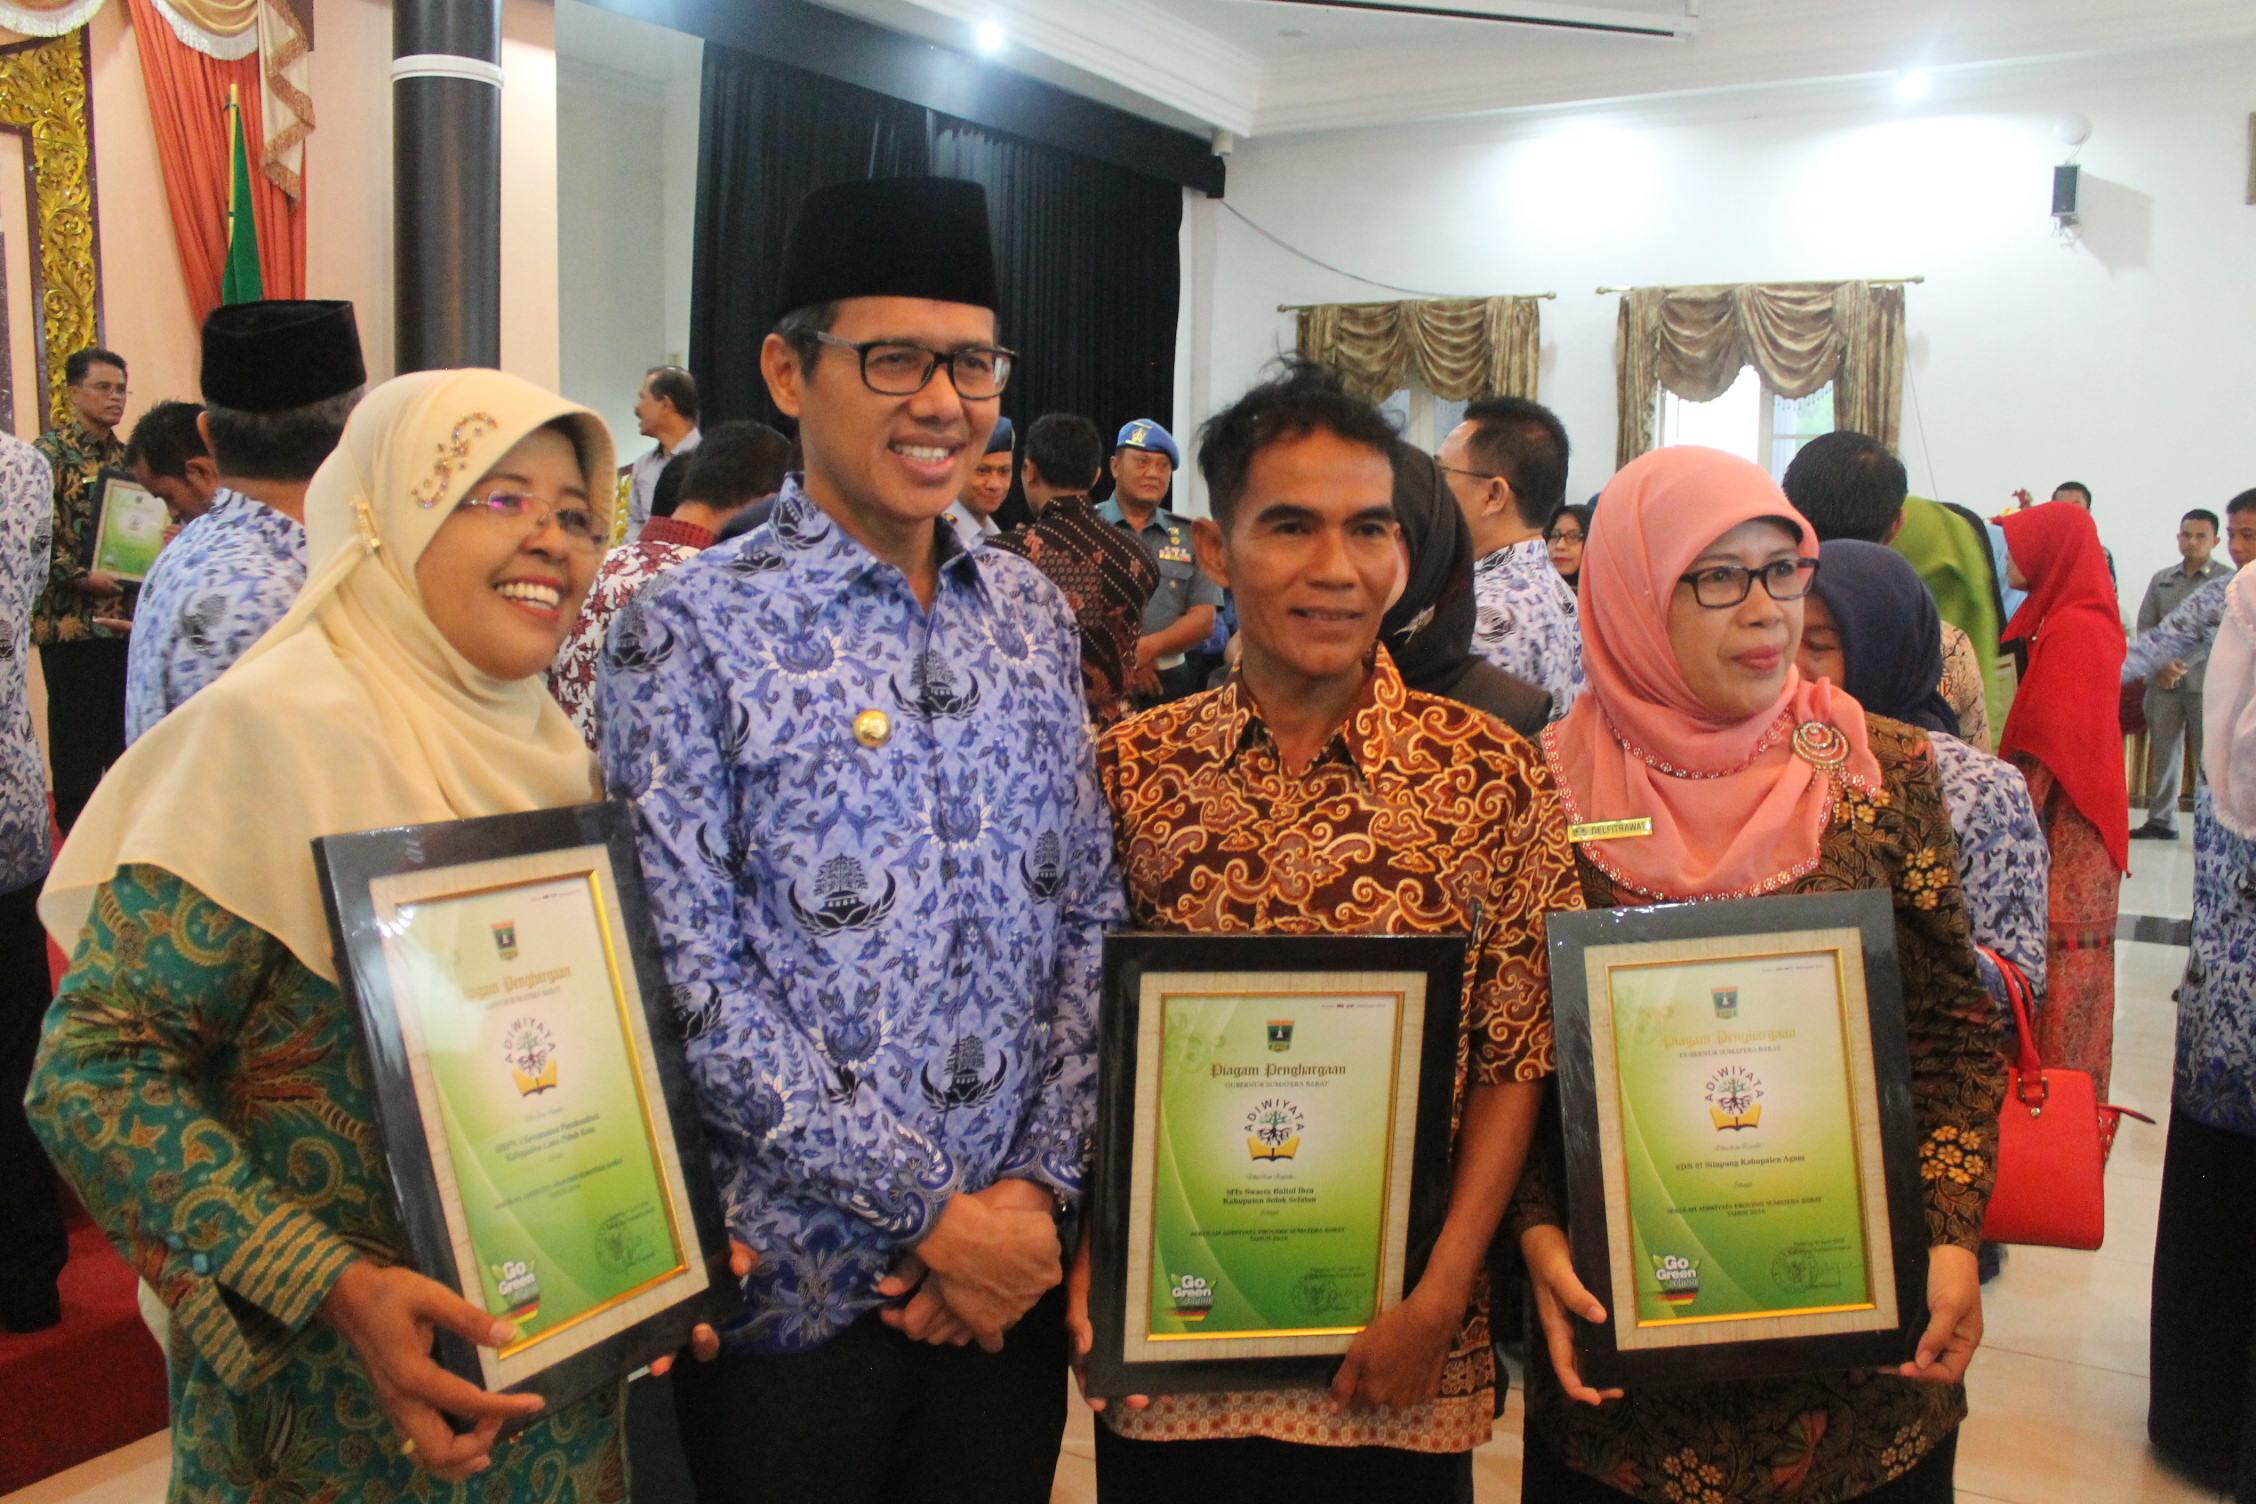 53 Sekolah Ditetapkan sebagai Sekolah Adiwiyata Provinsi Sumatera Barat Tahun 2016